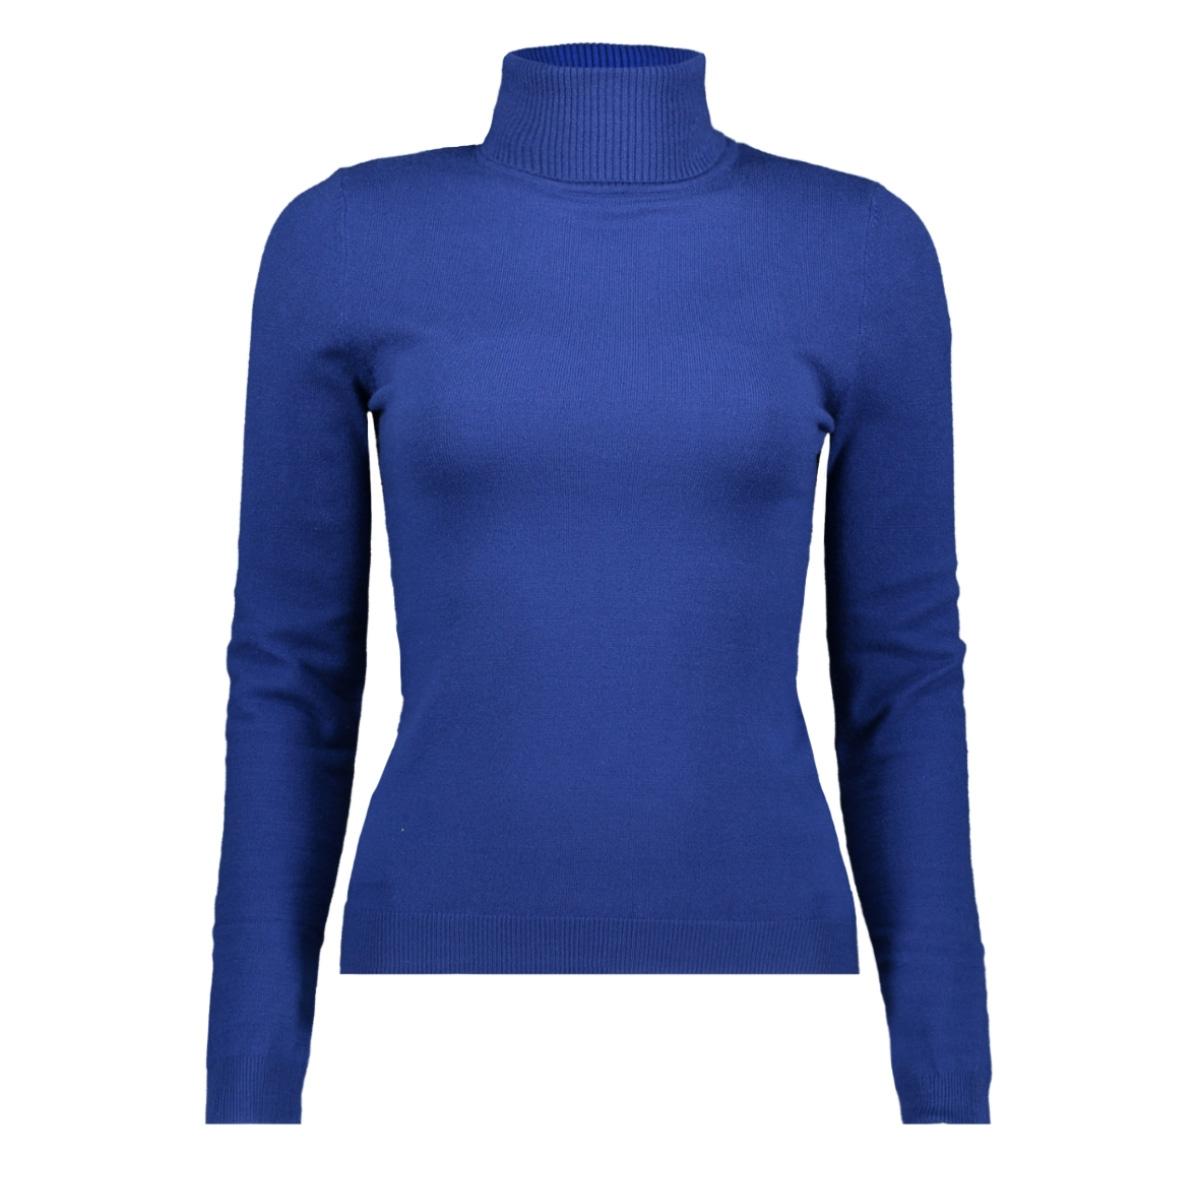 vmhappy basic ls rollneck blouse bo 10221302 vero moda t-shirt sodalite blue